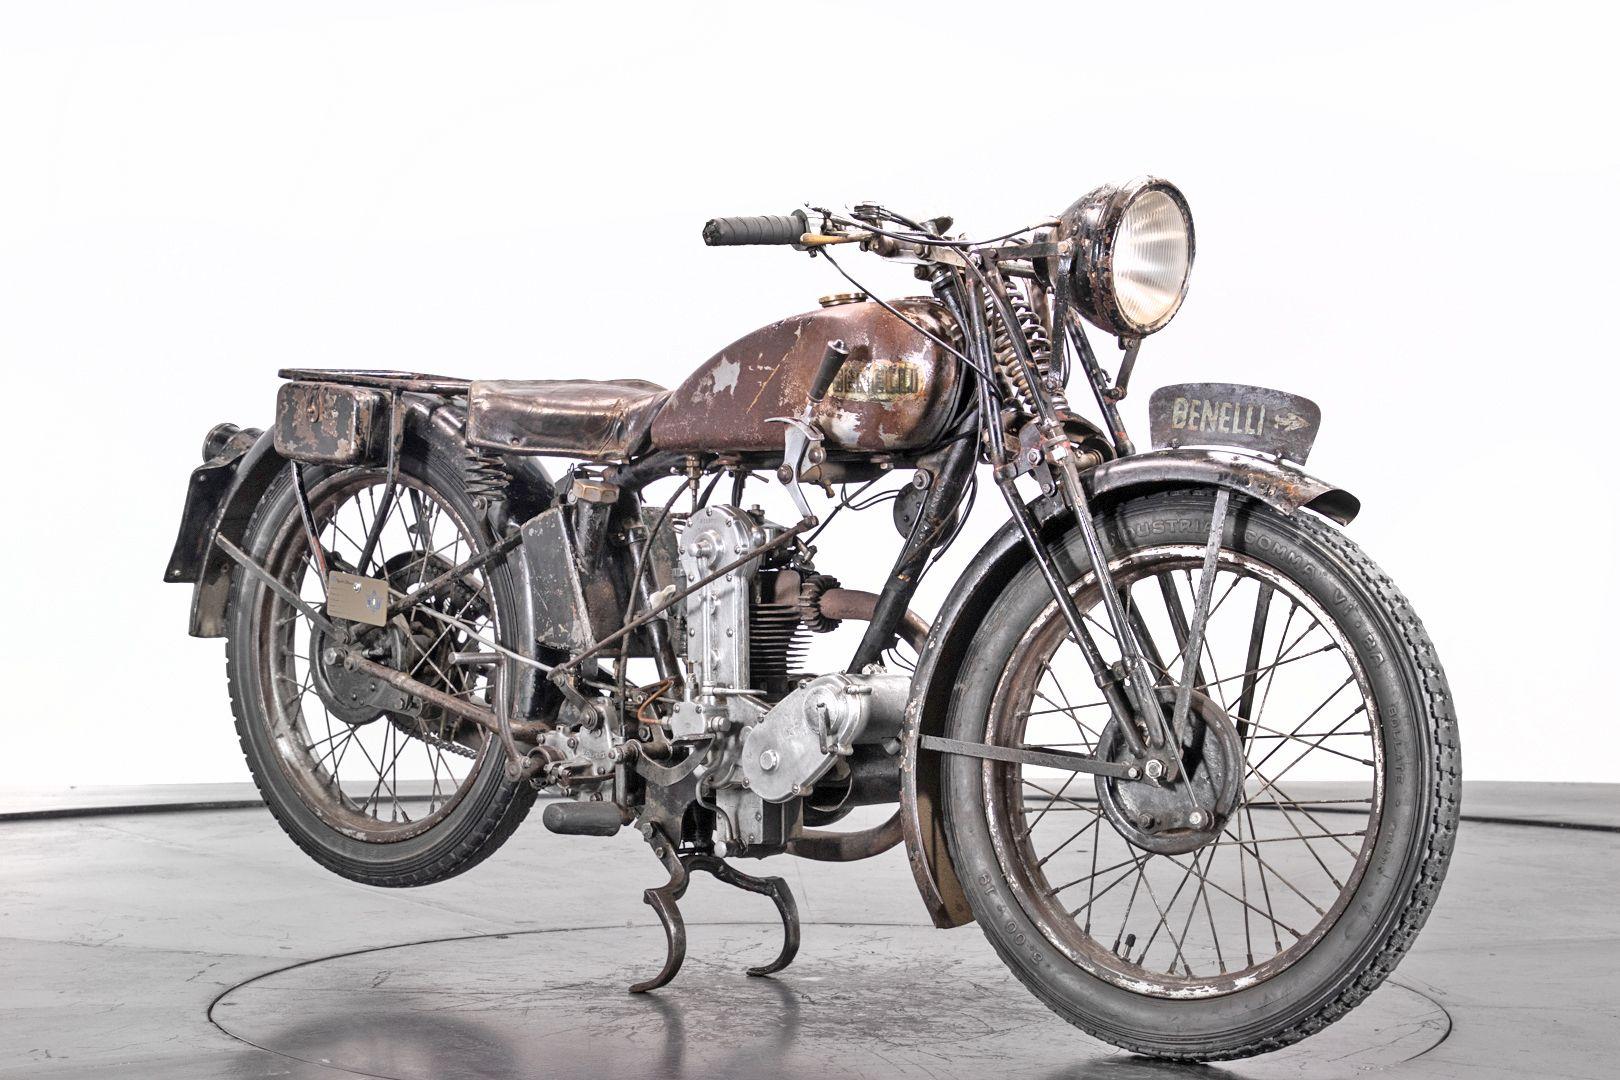 1938 Benelli 175 74490